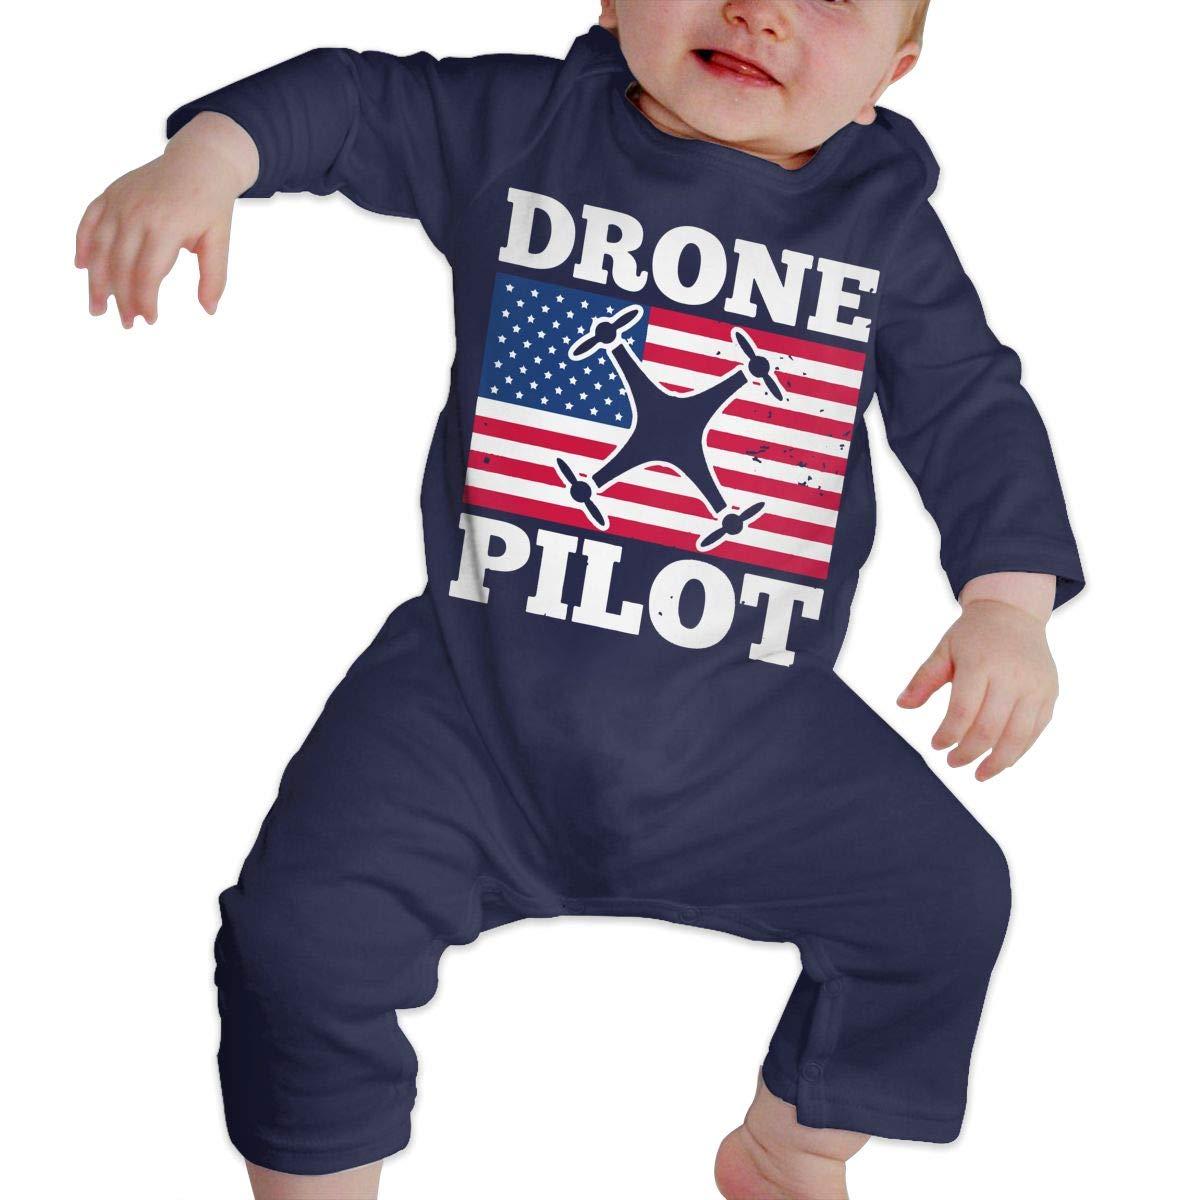 Drone Pilot Patriotic US American Flag Newborn Baby Girl Infant Sleep and Play Pajamas Sleeper